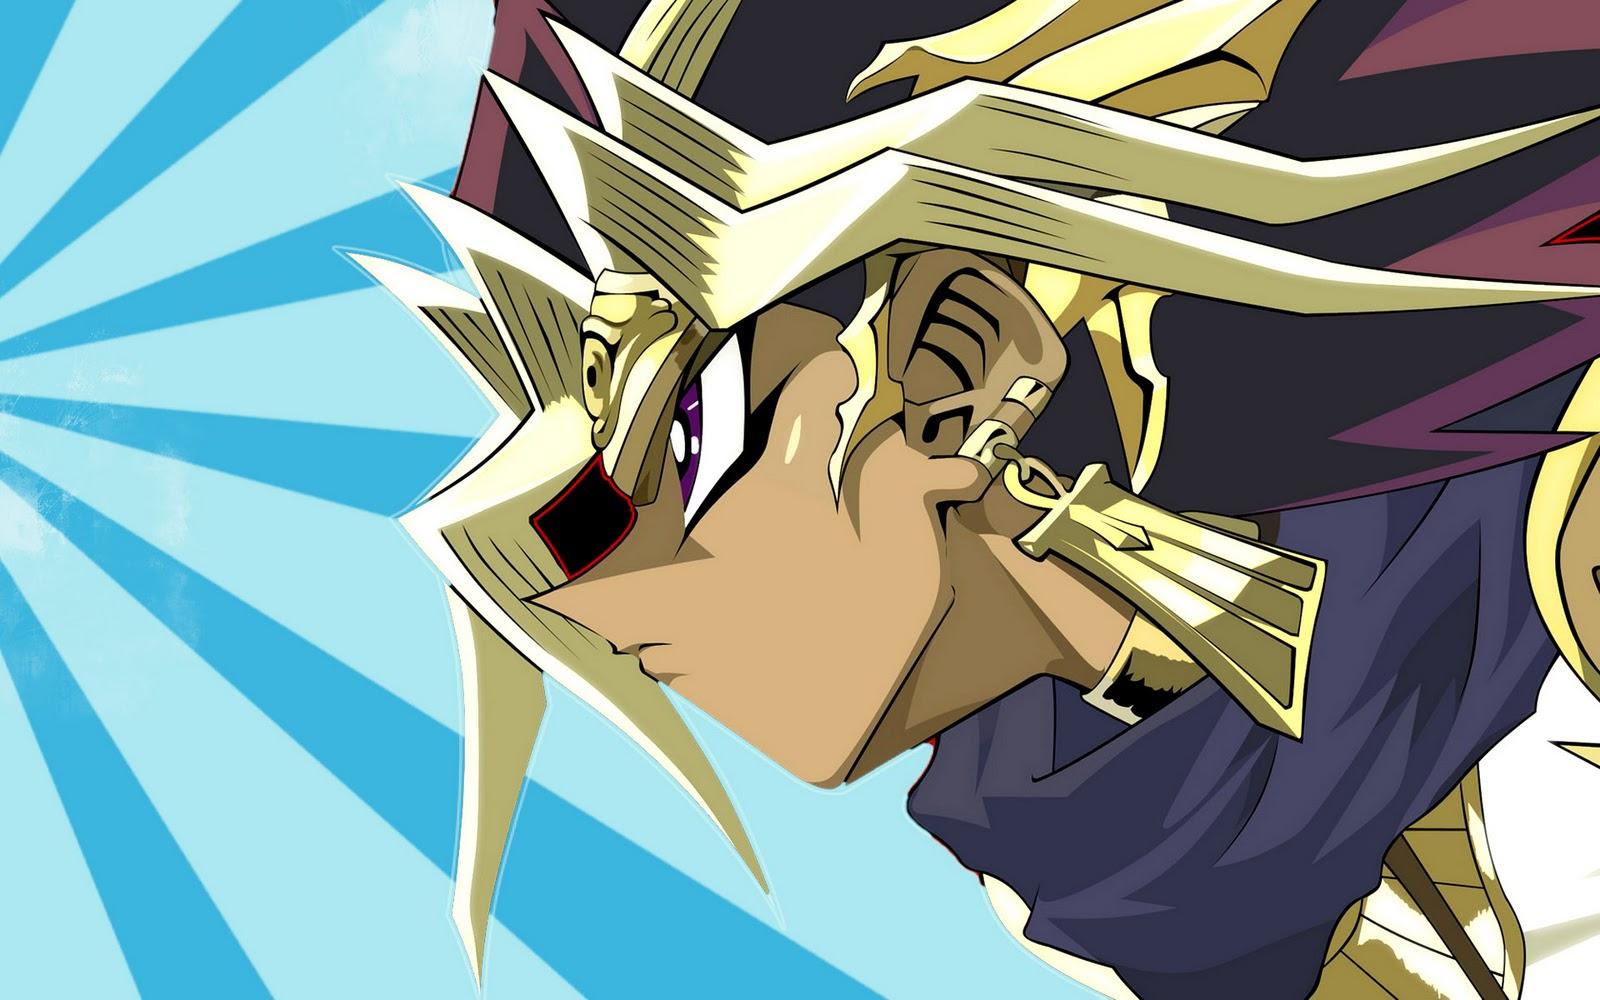 Yu Gi Oh HD Anime Wallpapers Desktop Wallpapers 1600x1000